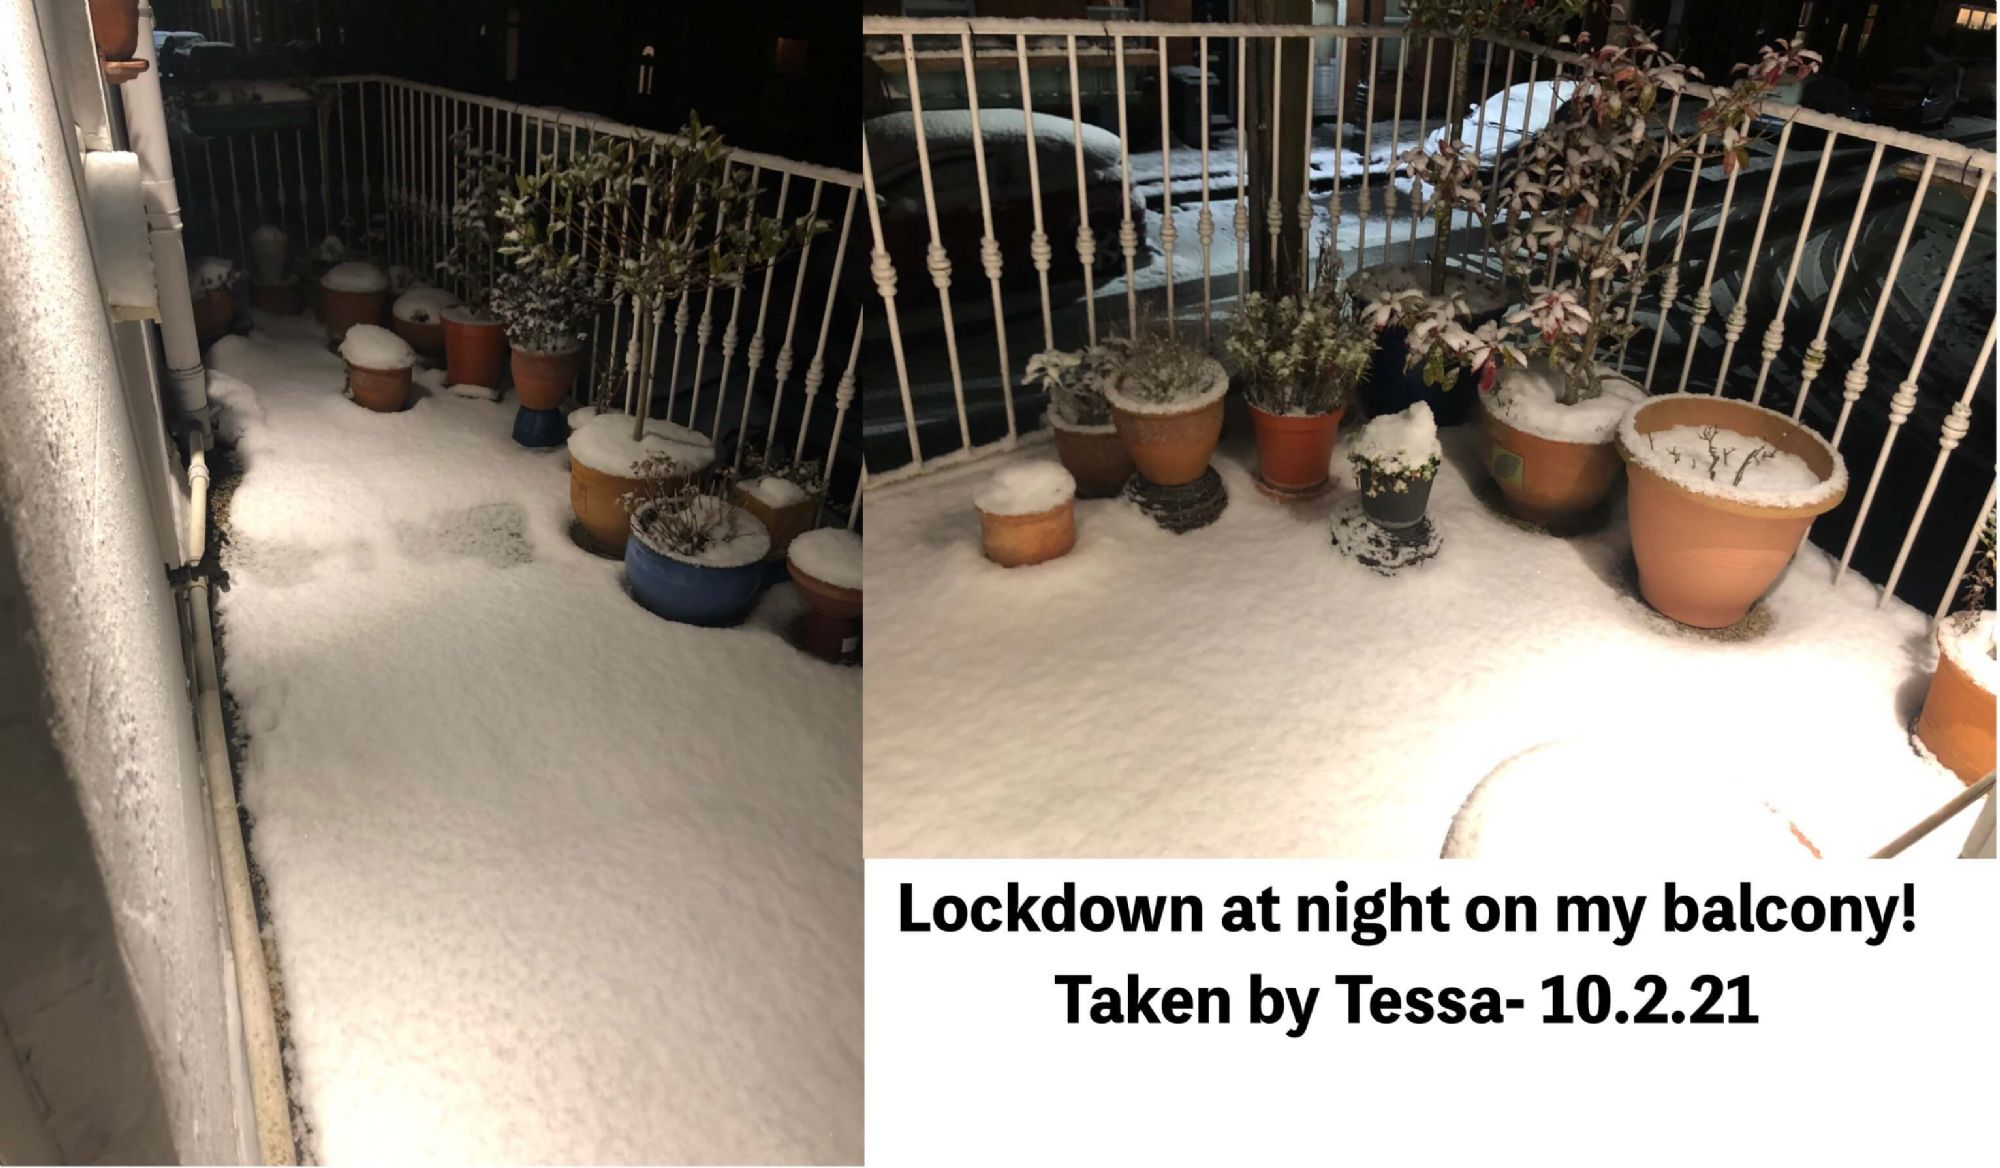 Lockdown at night on my balcony! Taken by Tessa